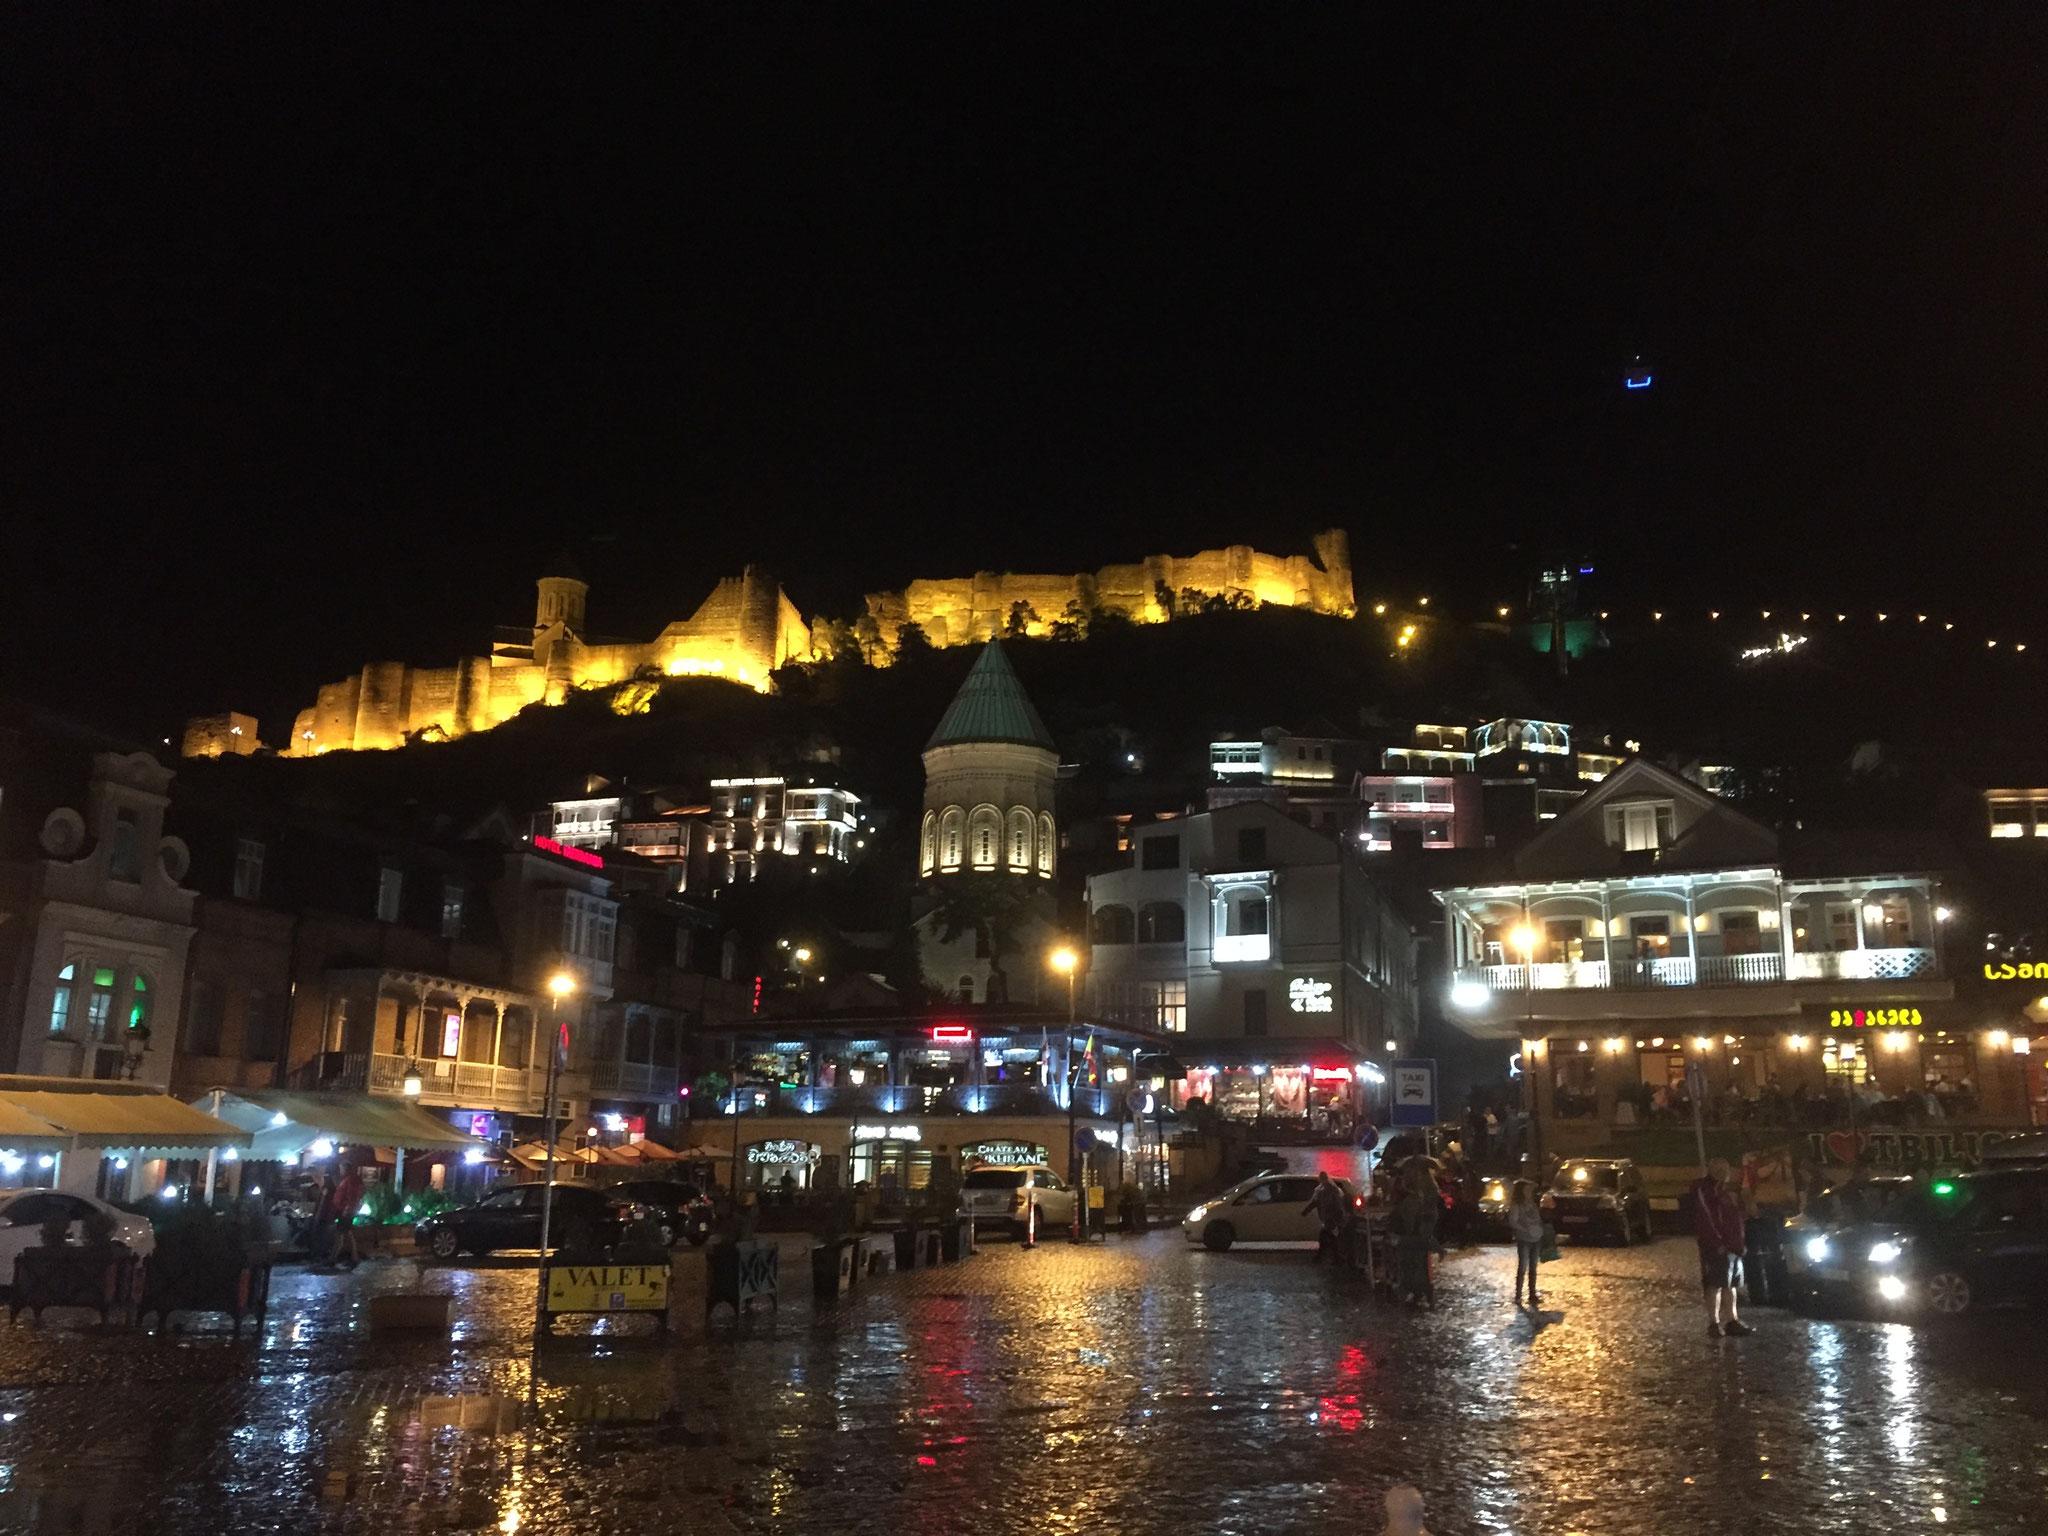 Narikala Festung in Tiflis